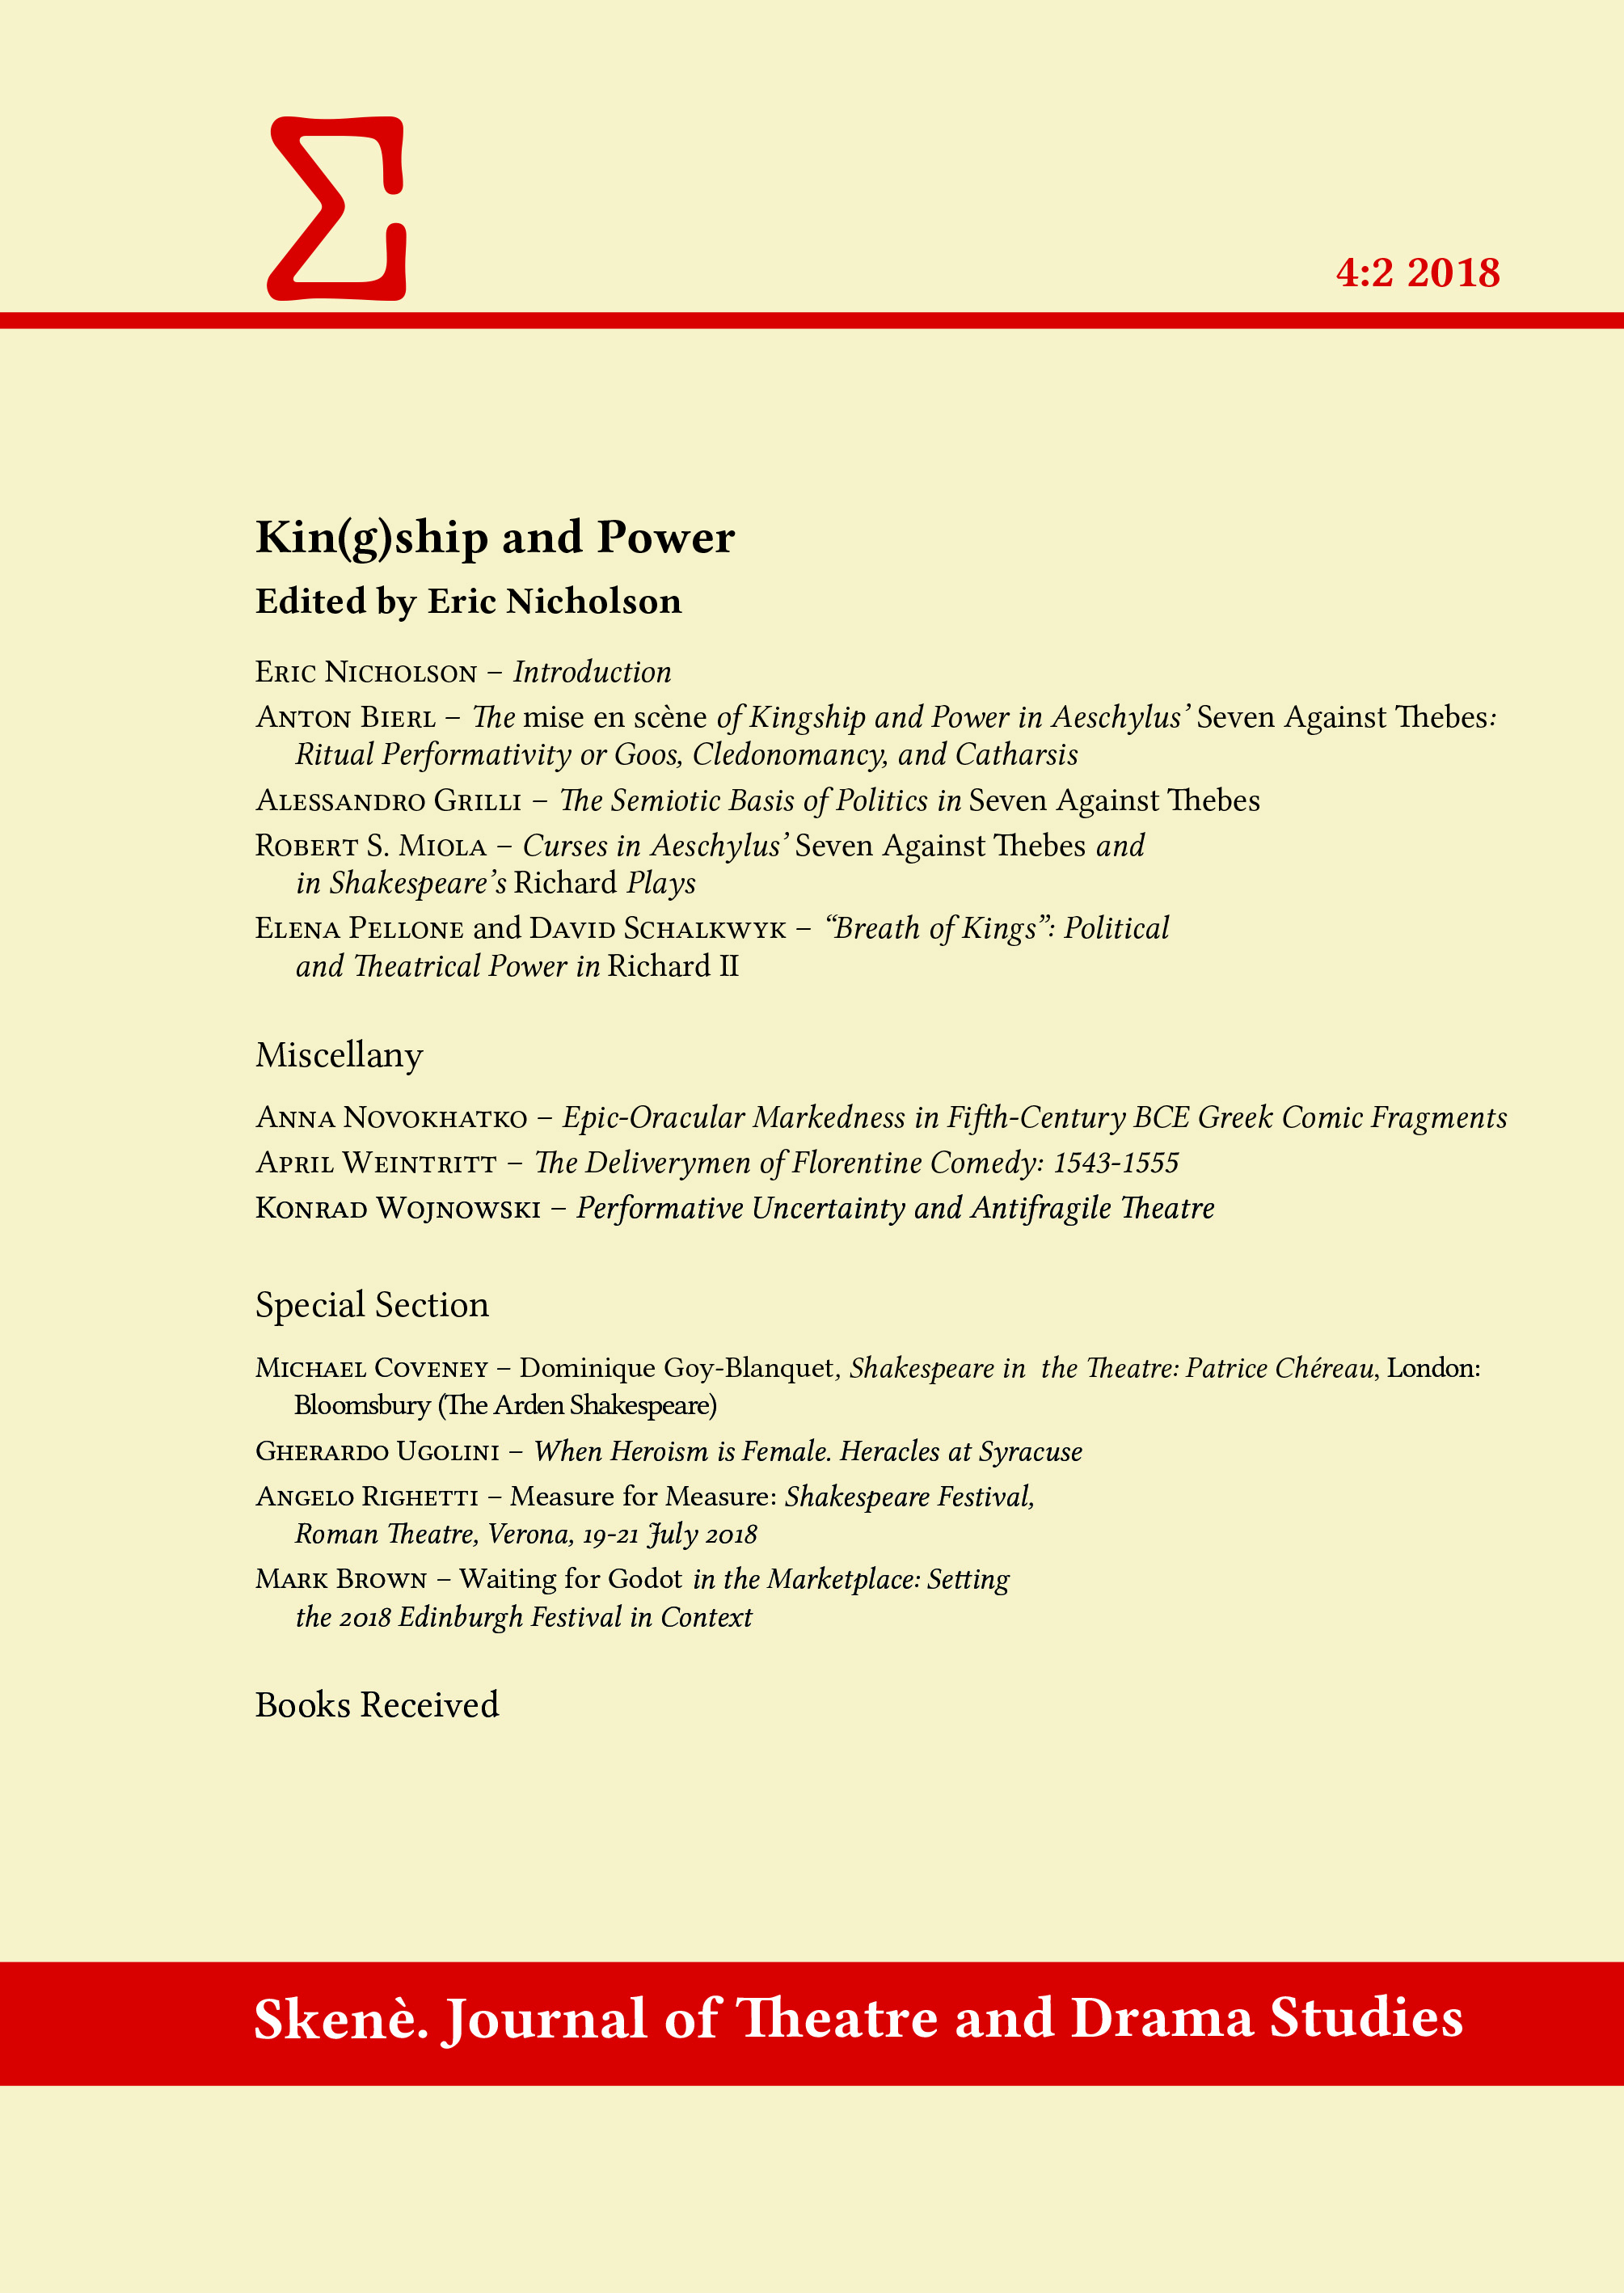 View Vol. 4 No. 2 (2018): Kin(g)ship and Power